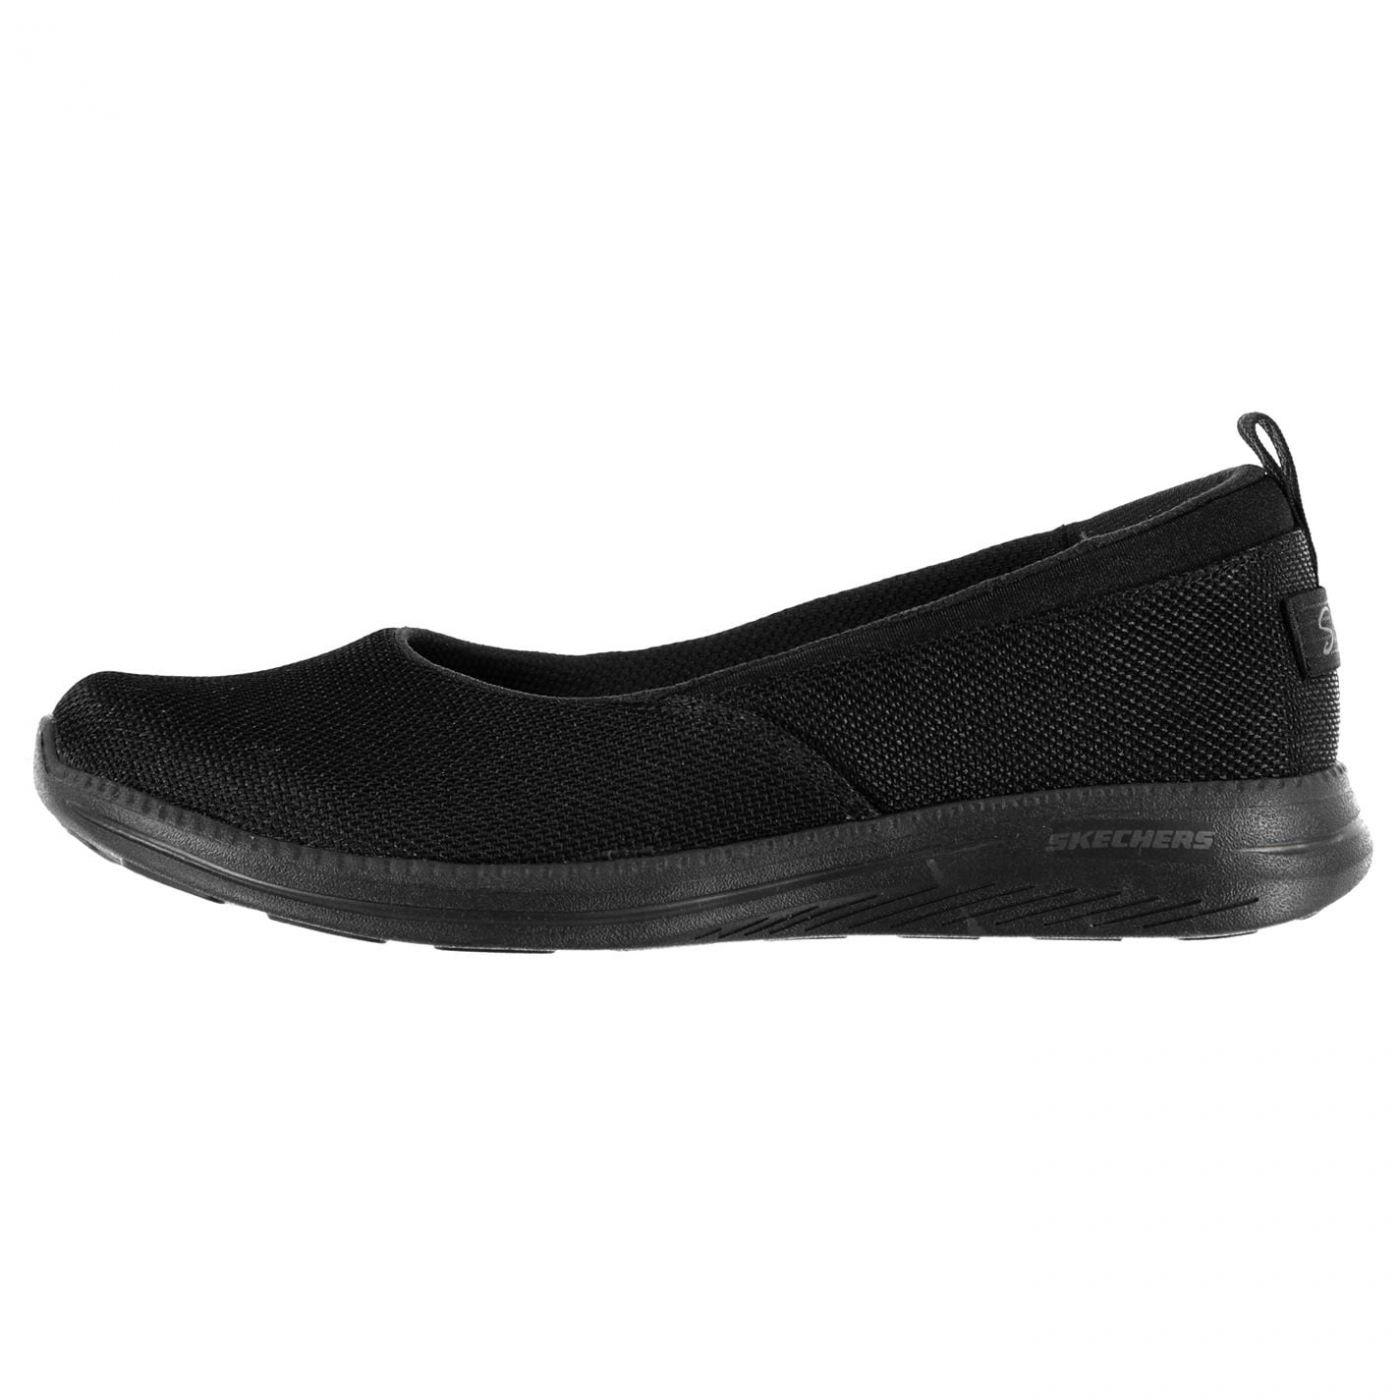 Skechers City Pro Slip On Shoes Ladies